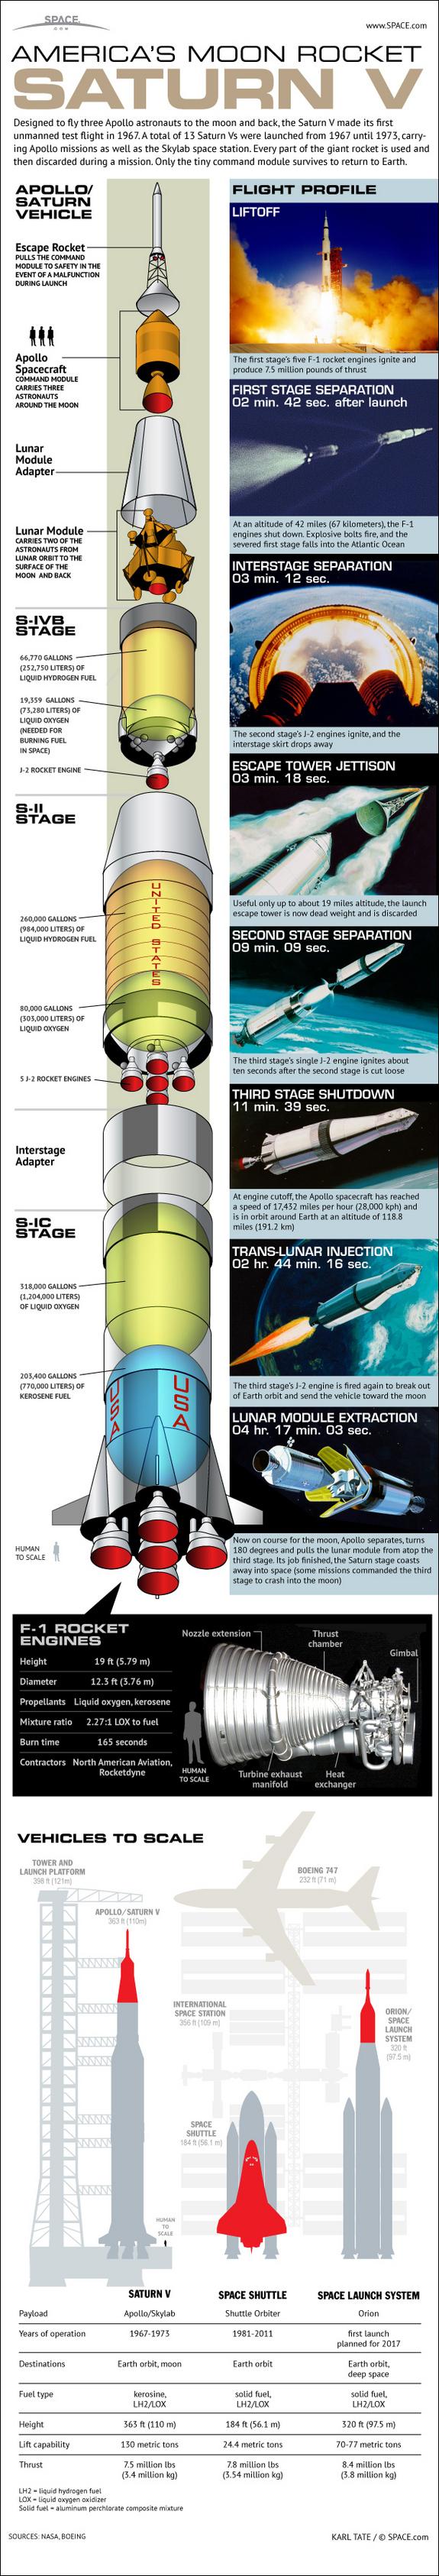 saturn-v-moon-rocket-45th-anniversary-121112a-02